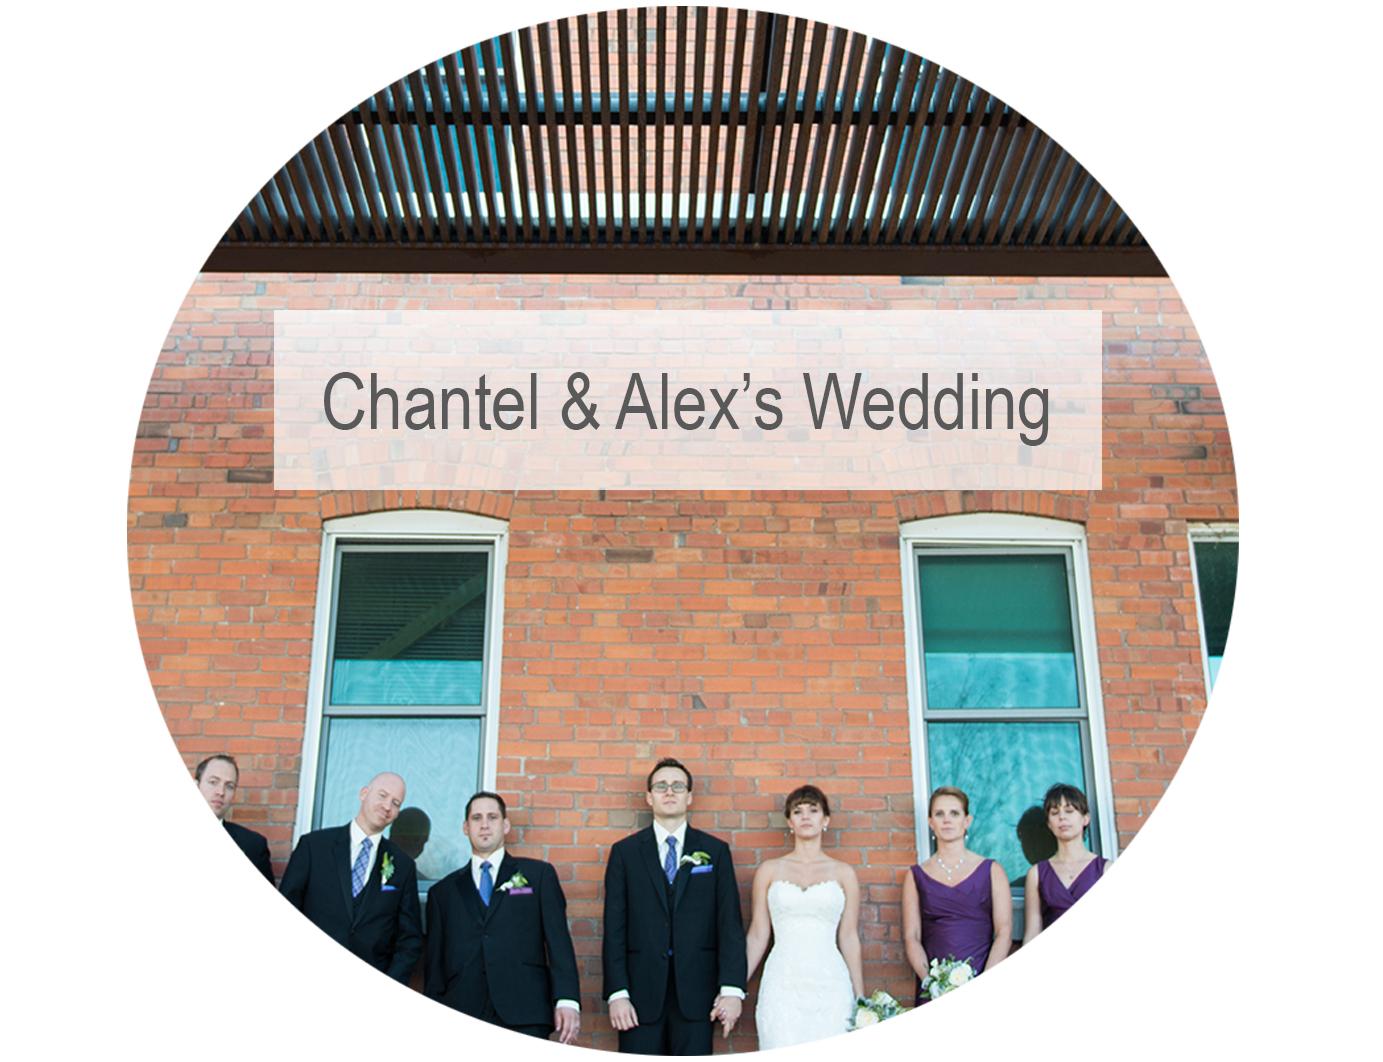 www.photos-by-adele.com/new-blog/2014/10/20/calgary-wedding-photographer-chantel-alexs-wedding